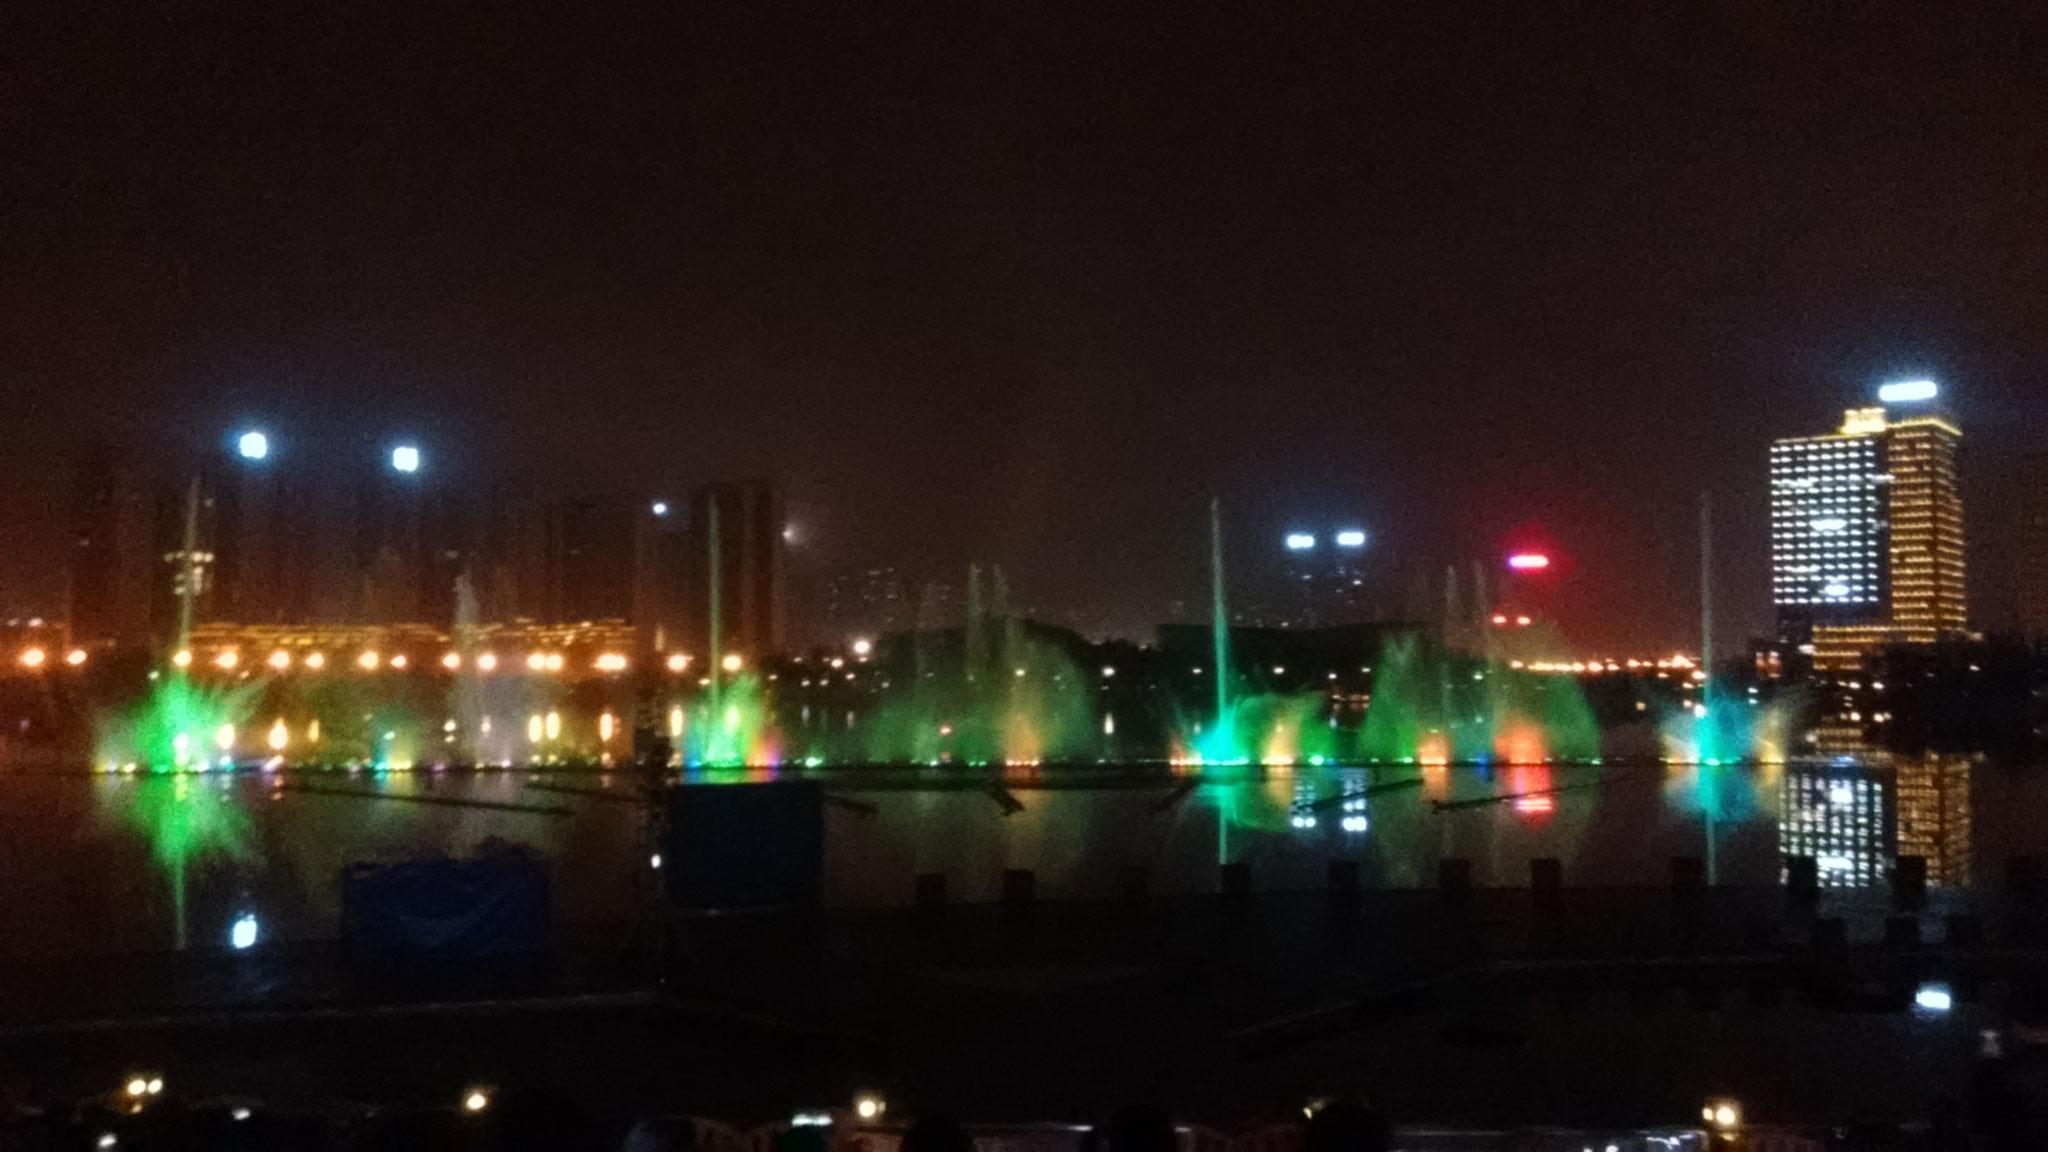 Wassershow in Zhuzhou